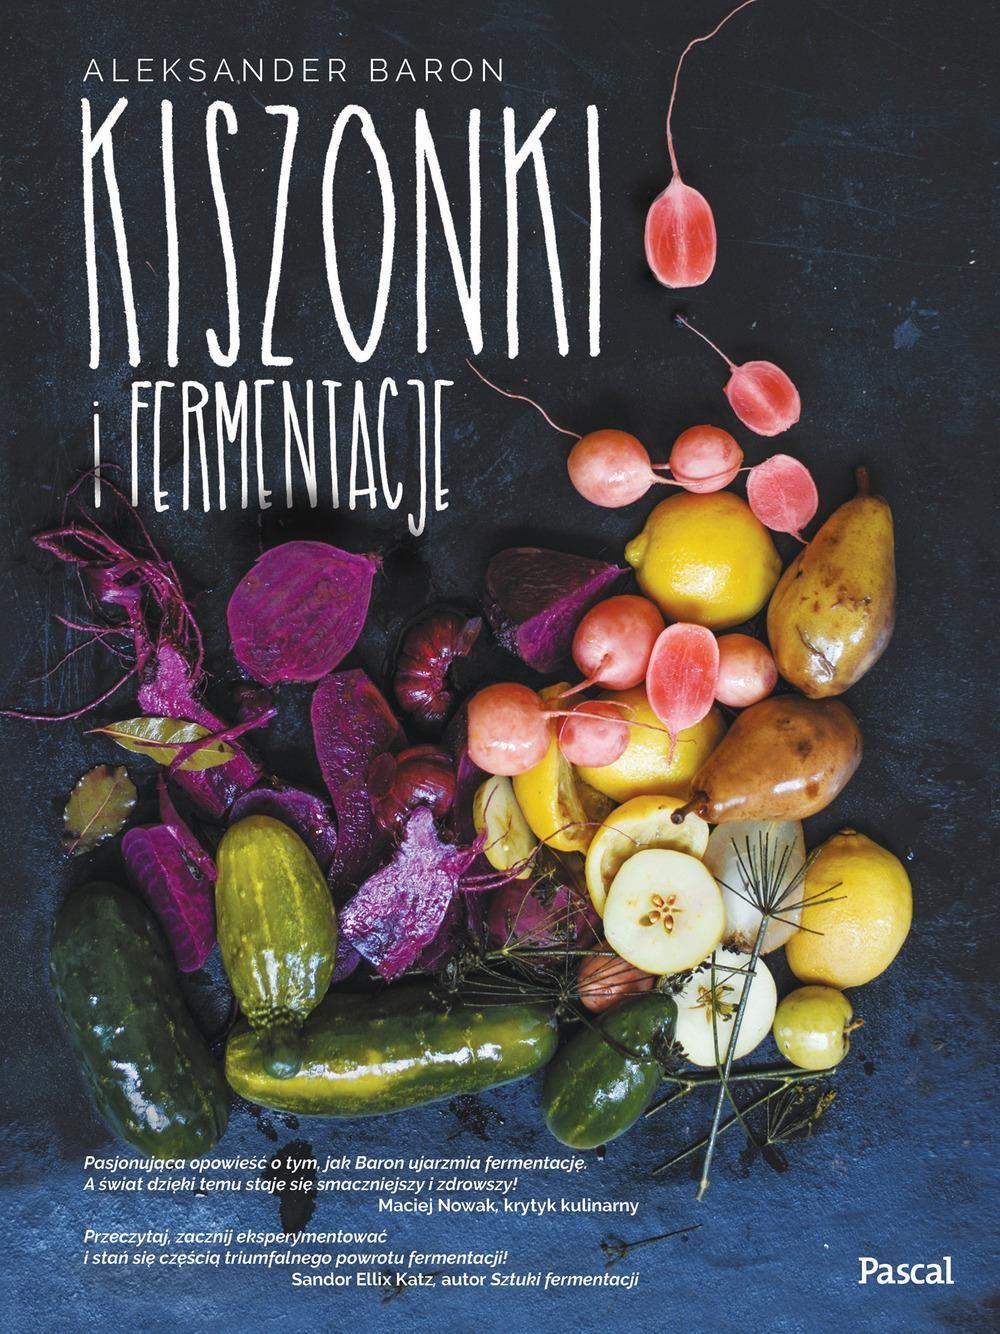 pikefinder.pl/upload_img/48390_i-kiszonki-i-fermentacje.jpg